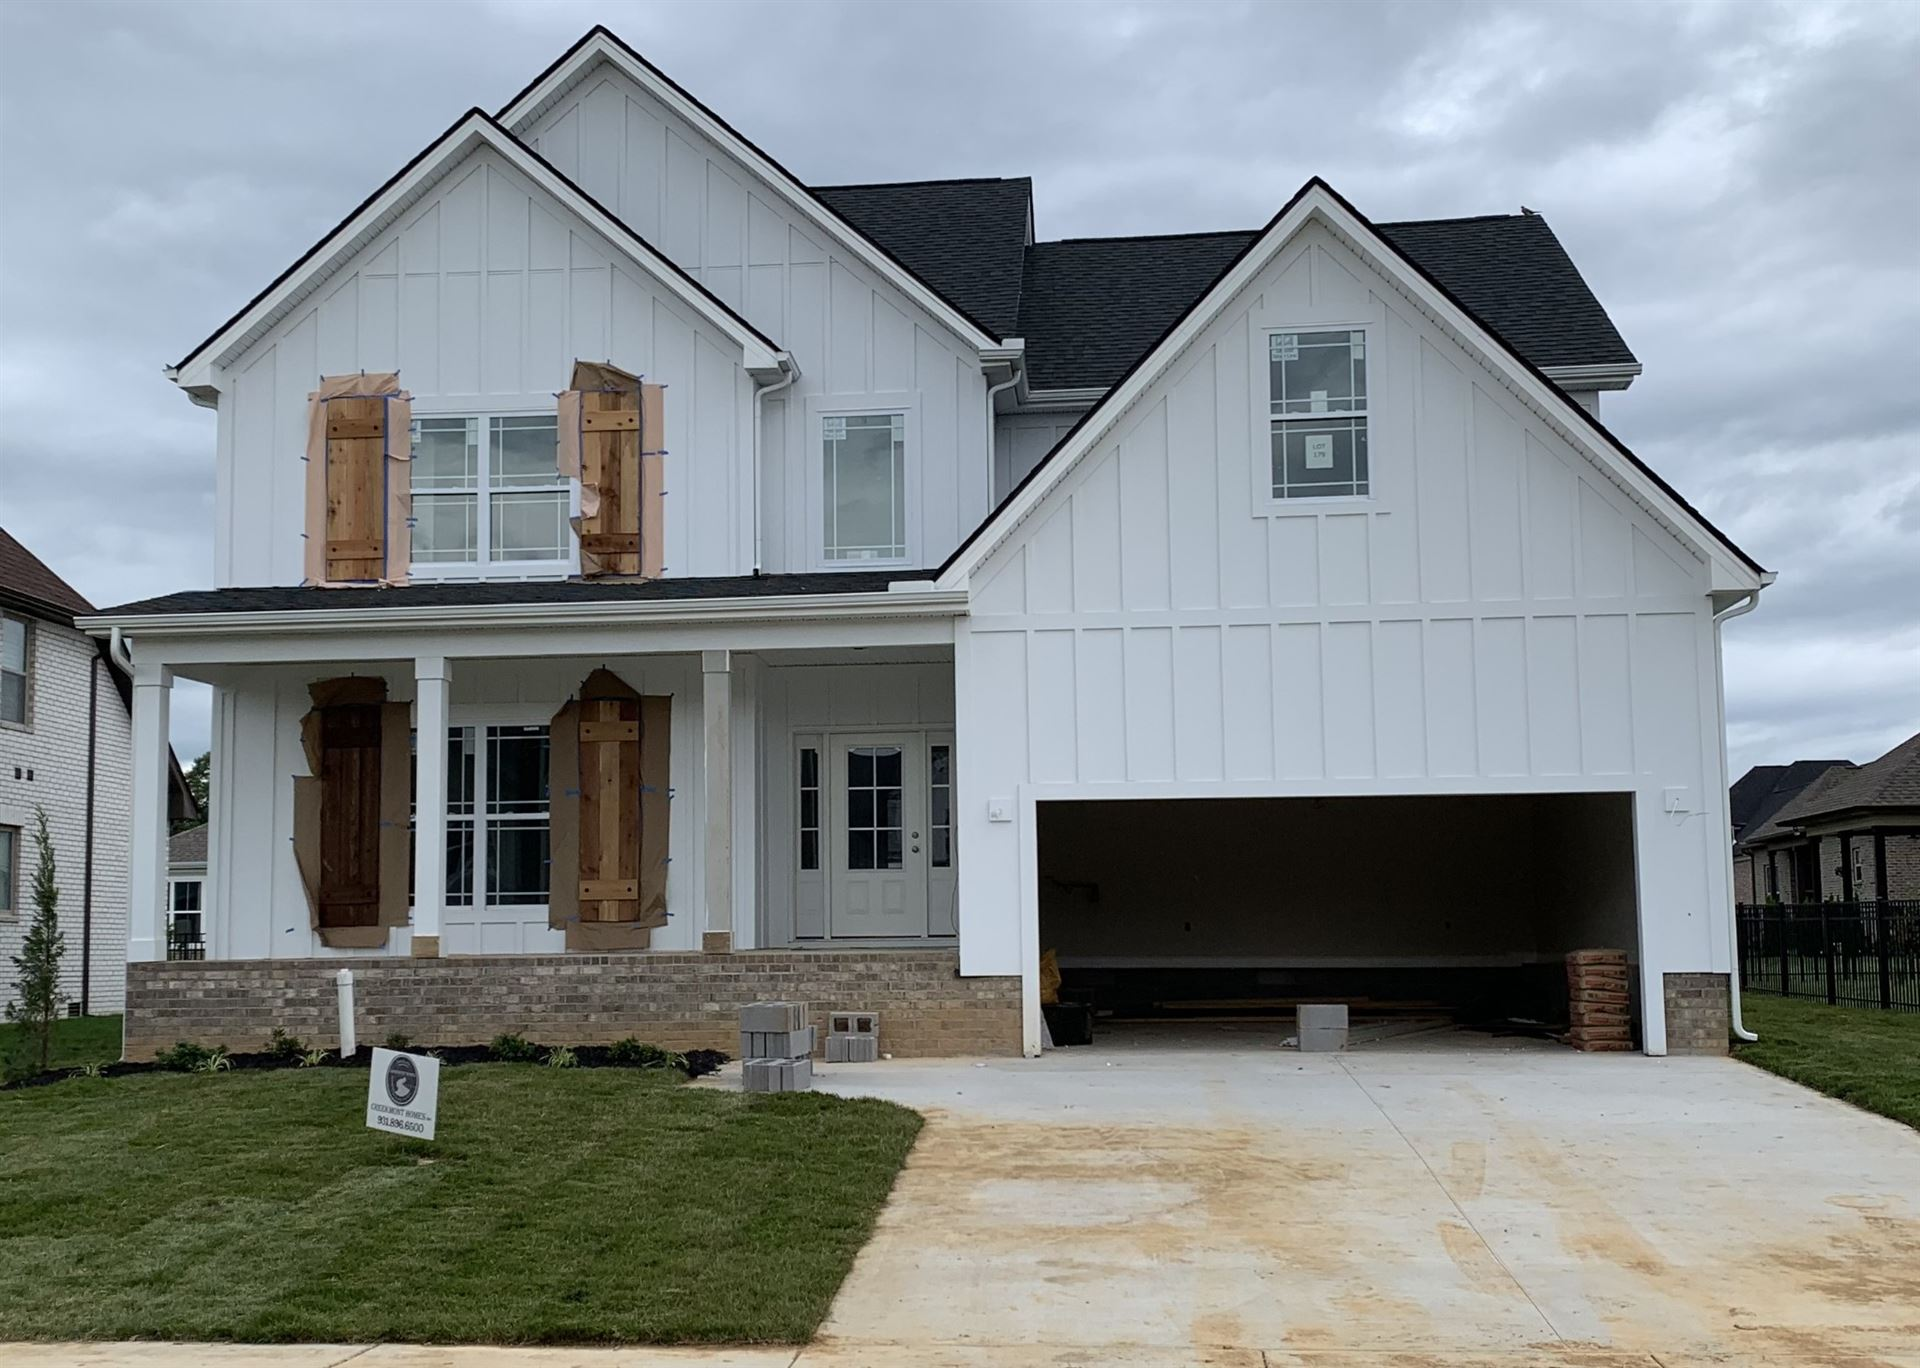 179 Hereford Farm, Clarksville, TN 37043 - MLS#: 2242053